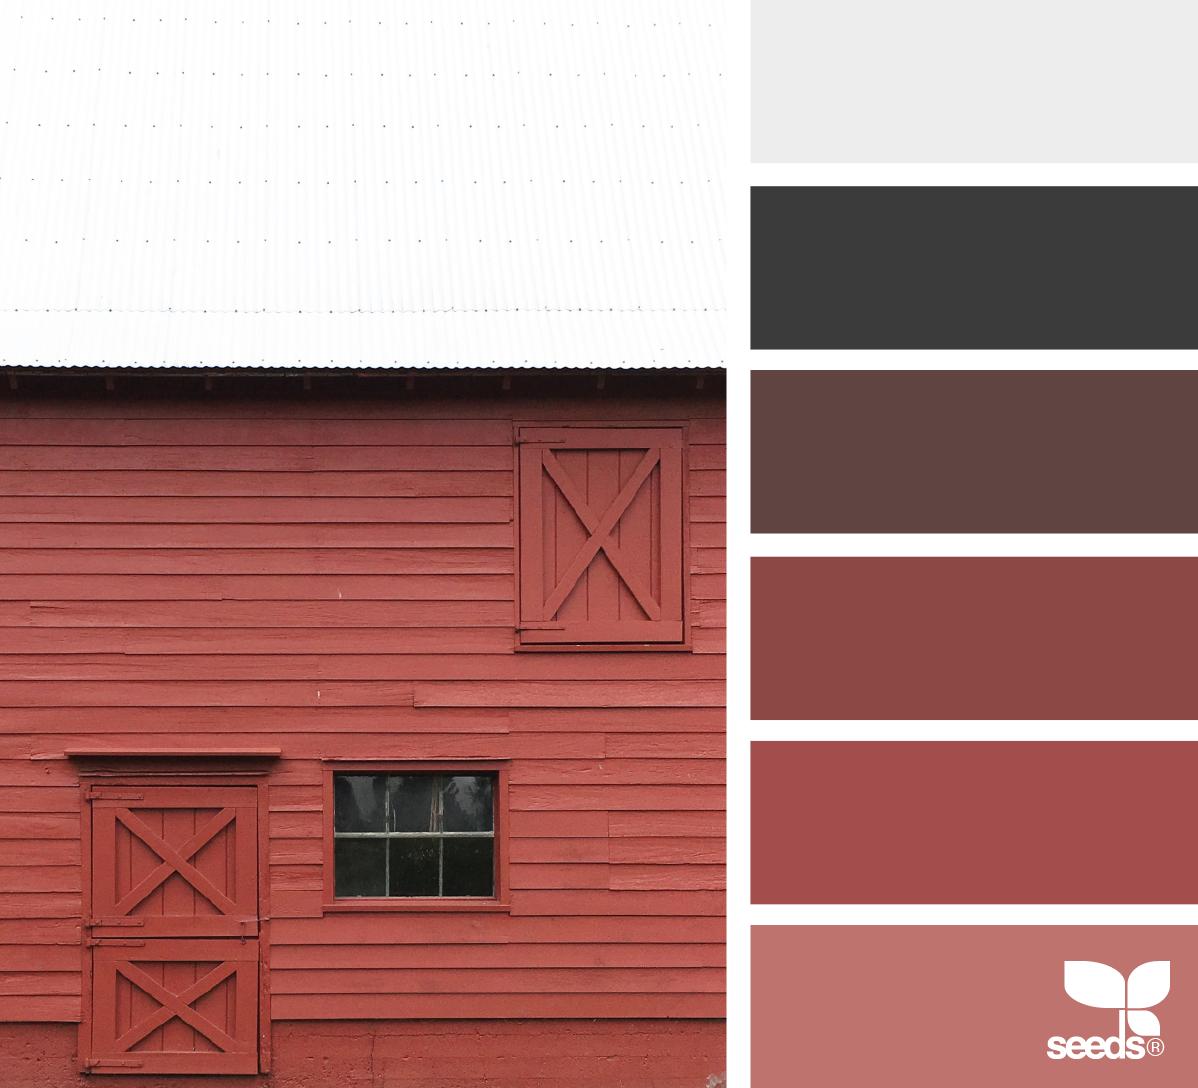 Barn Tones Image Via Suertj Color Palette Designseeds Seeds Seedscolor Red Barn Rustic Color Schemes Rustic Color Palettes Design Seeds